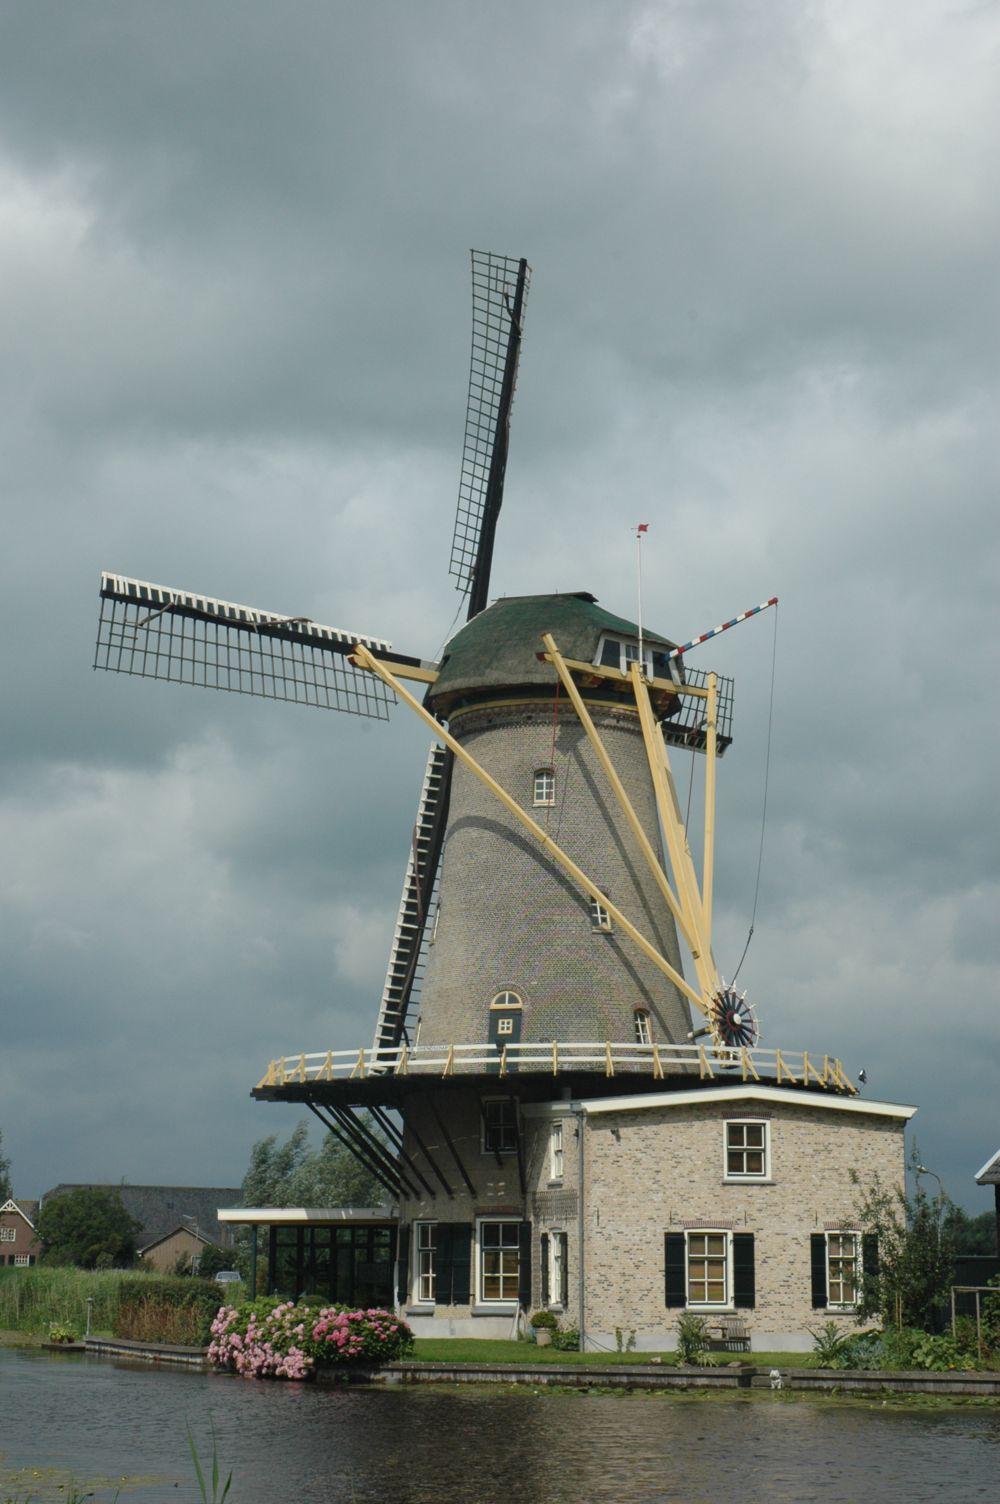 Academy of st martin in the fields vriendschap village pella ia 50219